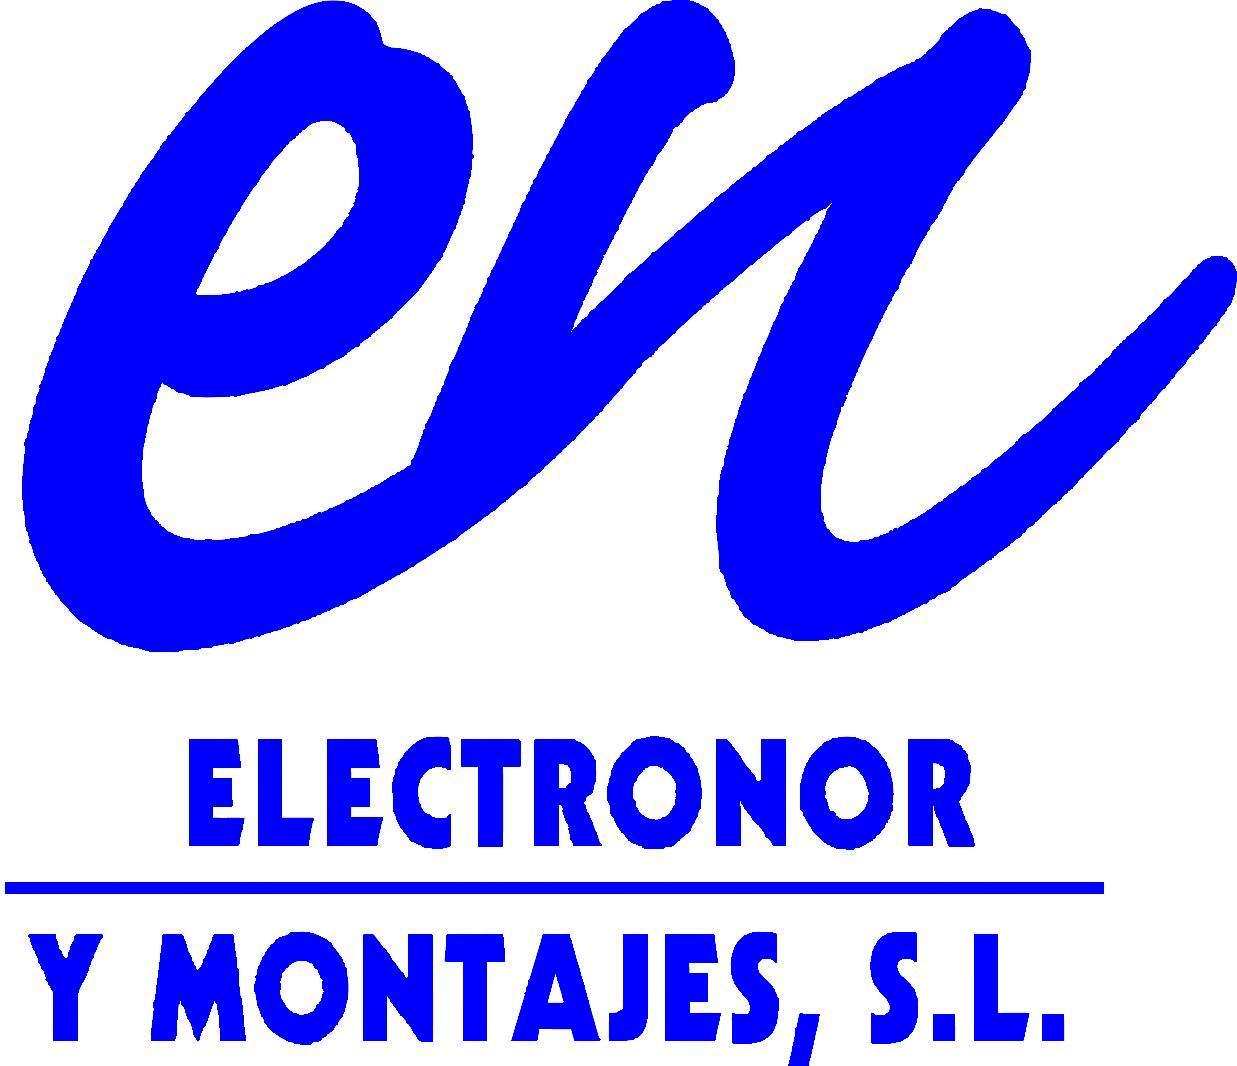 Electronor y Montajes, S.L.